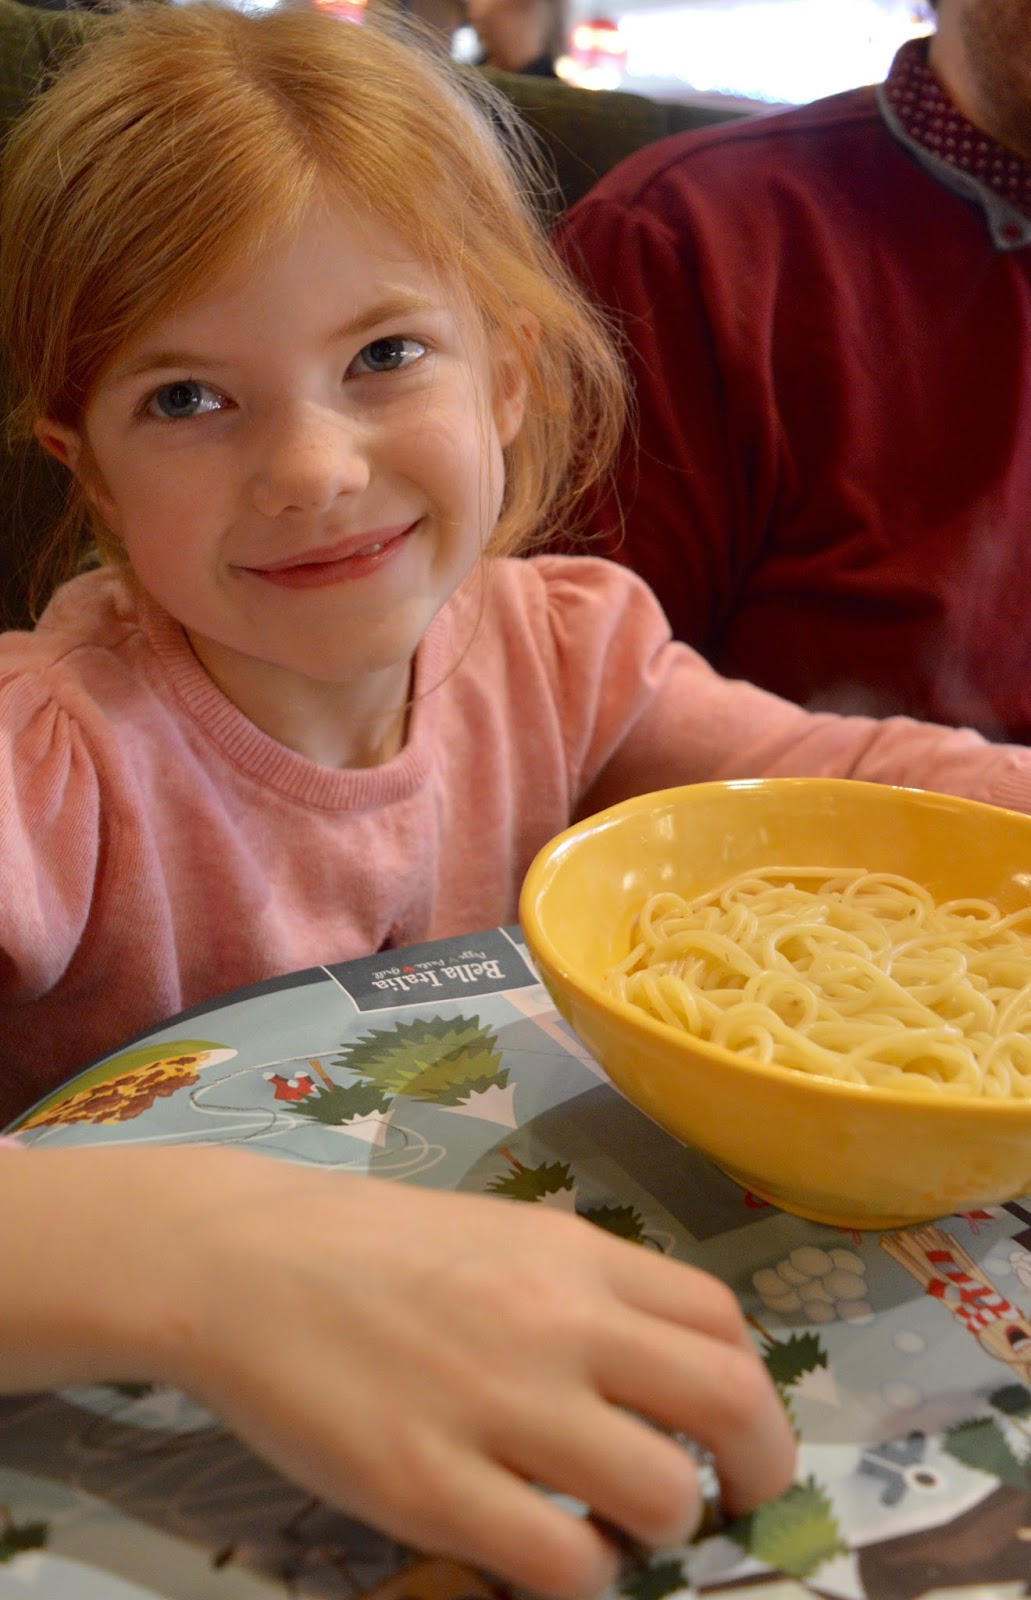 Bella Italia at intu Eldon Square Newcastle | Children's Menu Review - kids plain pasta